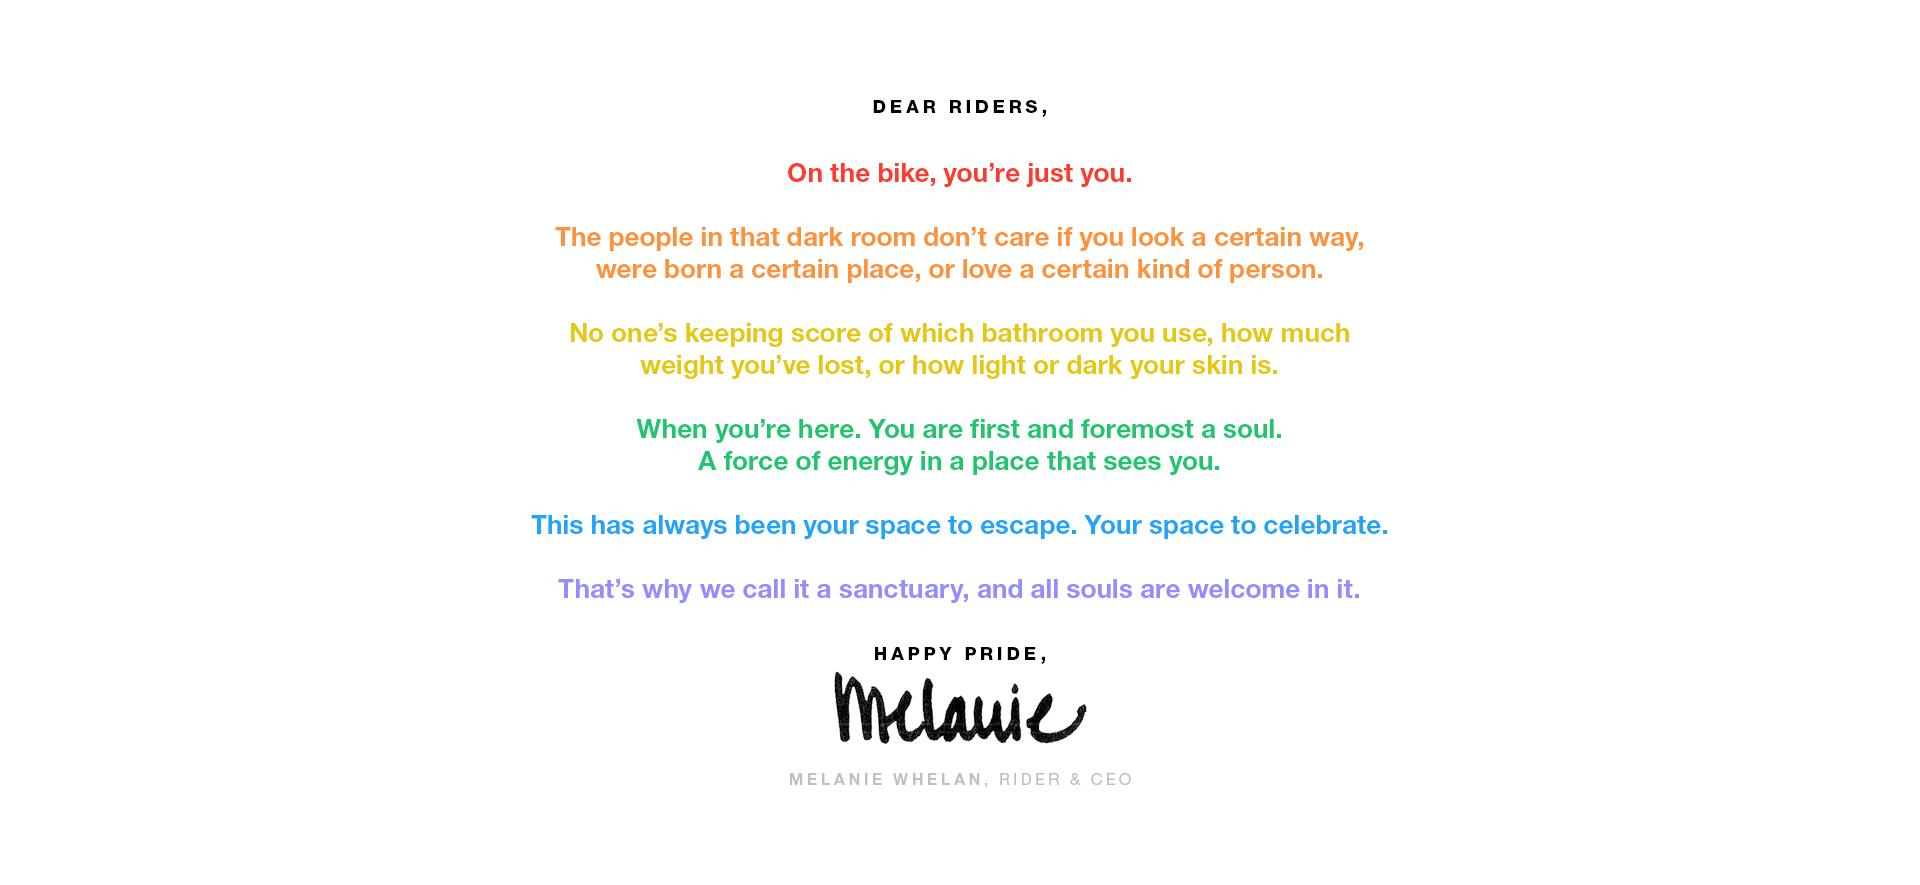 SC_Pride_Microsite_LetterFromMel.jpg